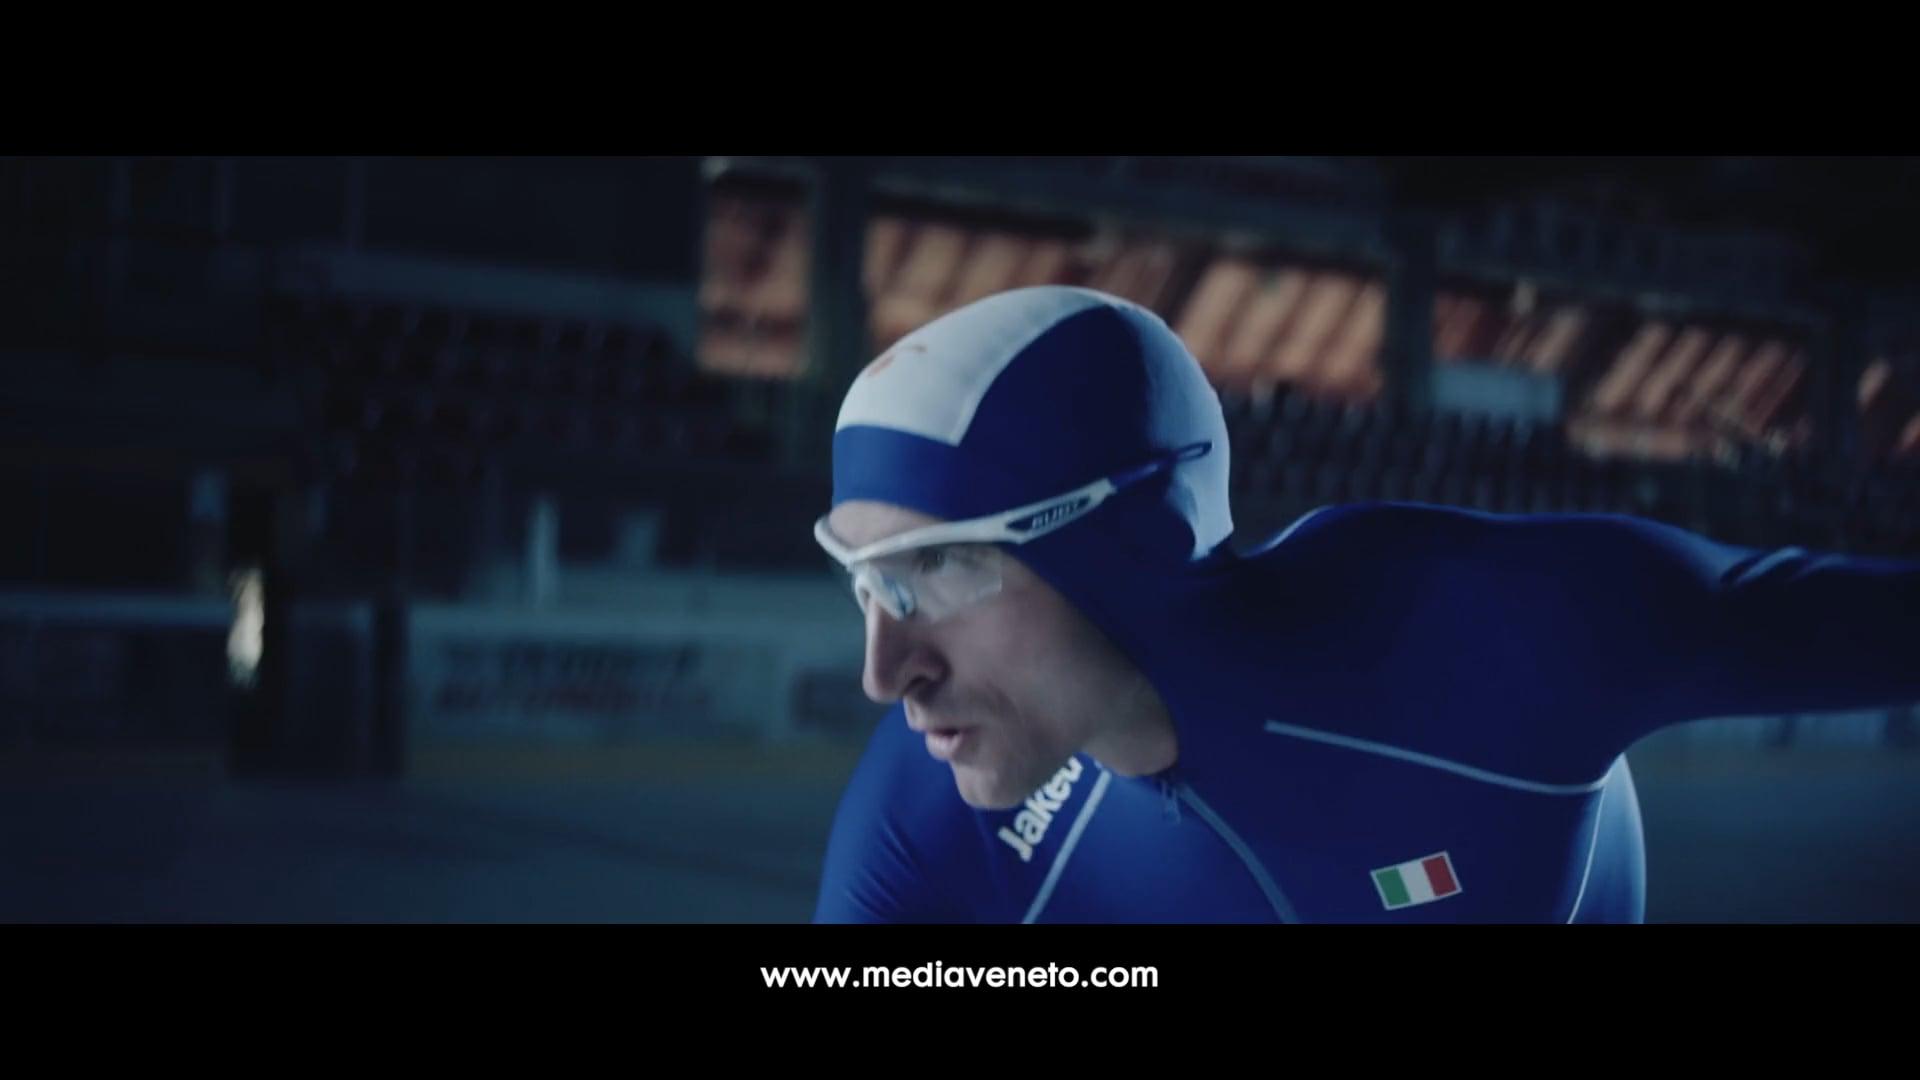 MEDIAVENETO ADSL - Enrico Fabris